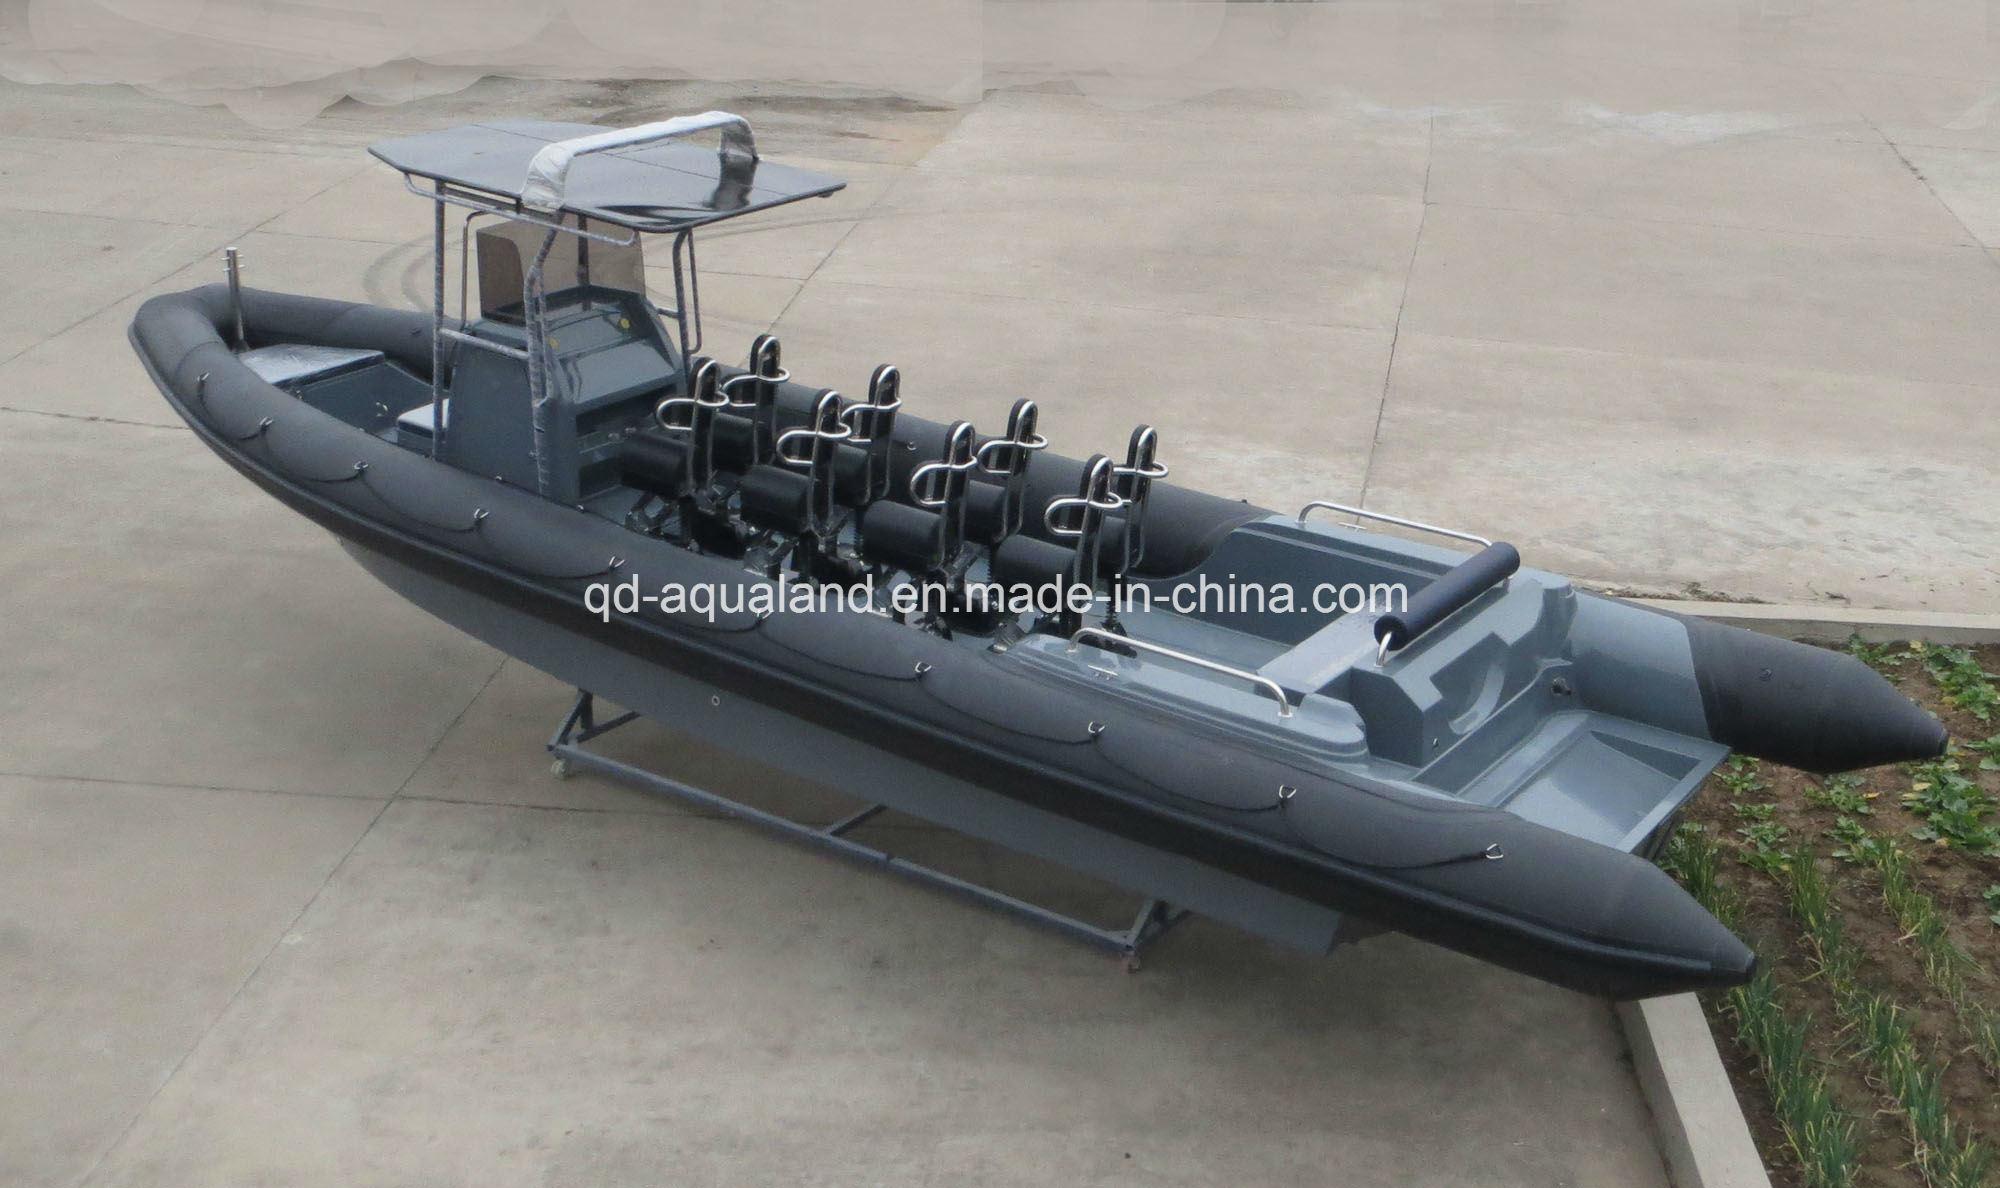 China Aqualand 36feet 11m Fiberglass Rigid Inflatable Motor Boat/Rib Military Patrol Boat/Rescue Diving Boat (RIB1050)